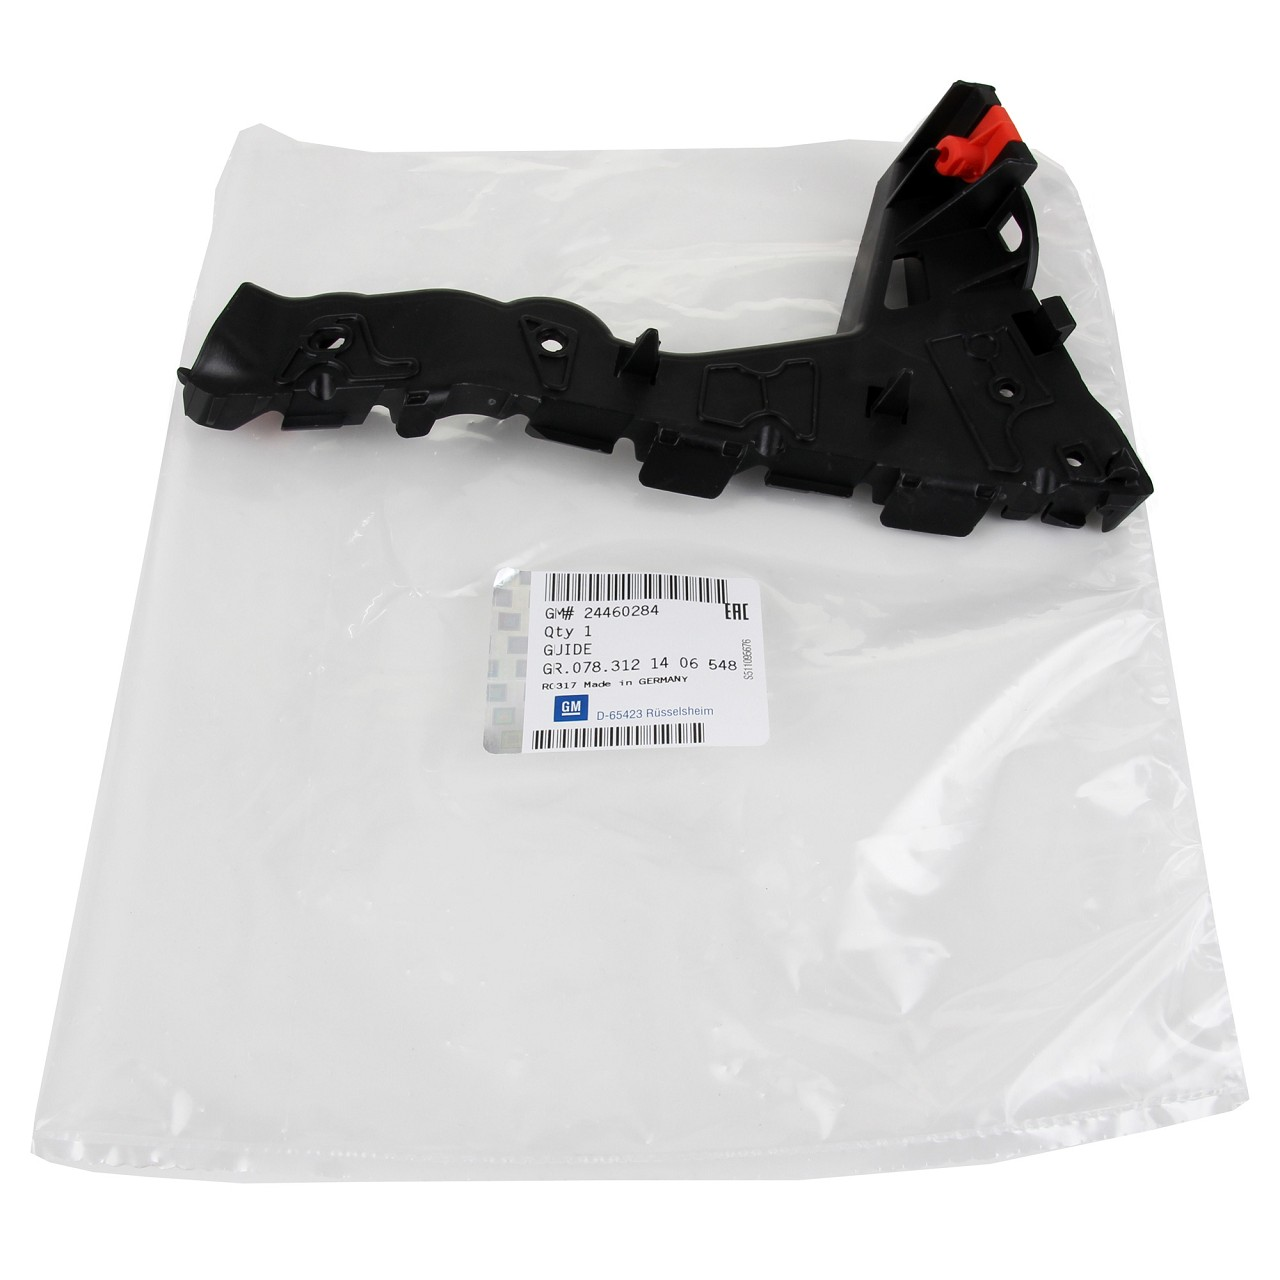 ORIGINAL Opel Führungsschiene Stoßstangenhalter ASTRA H rechts 24460284